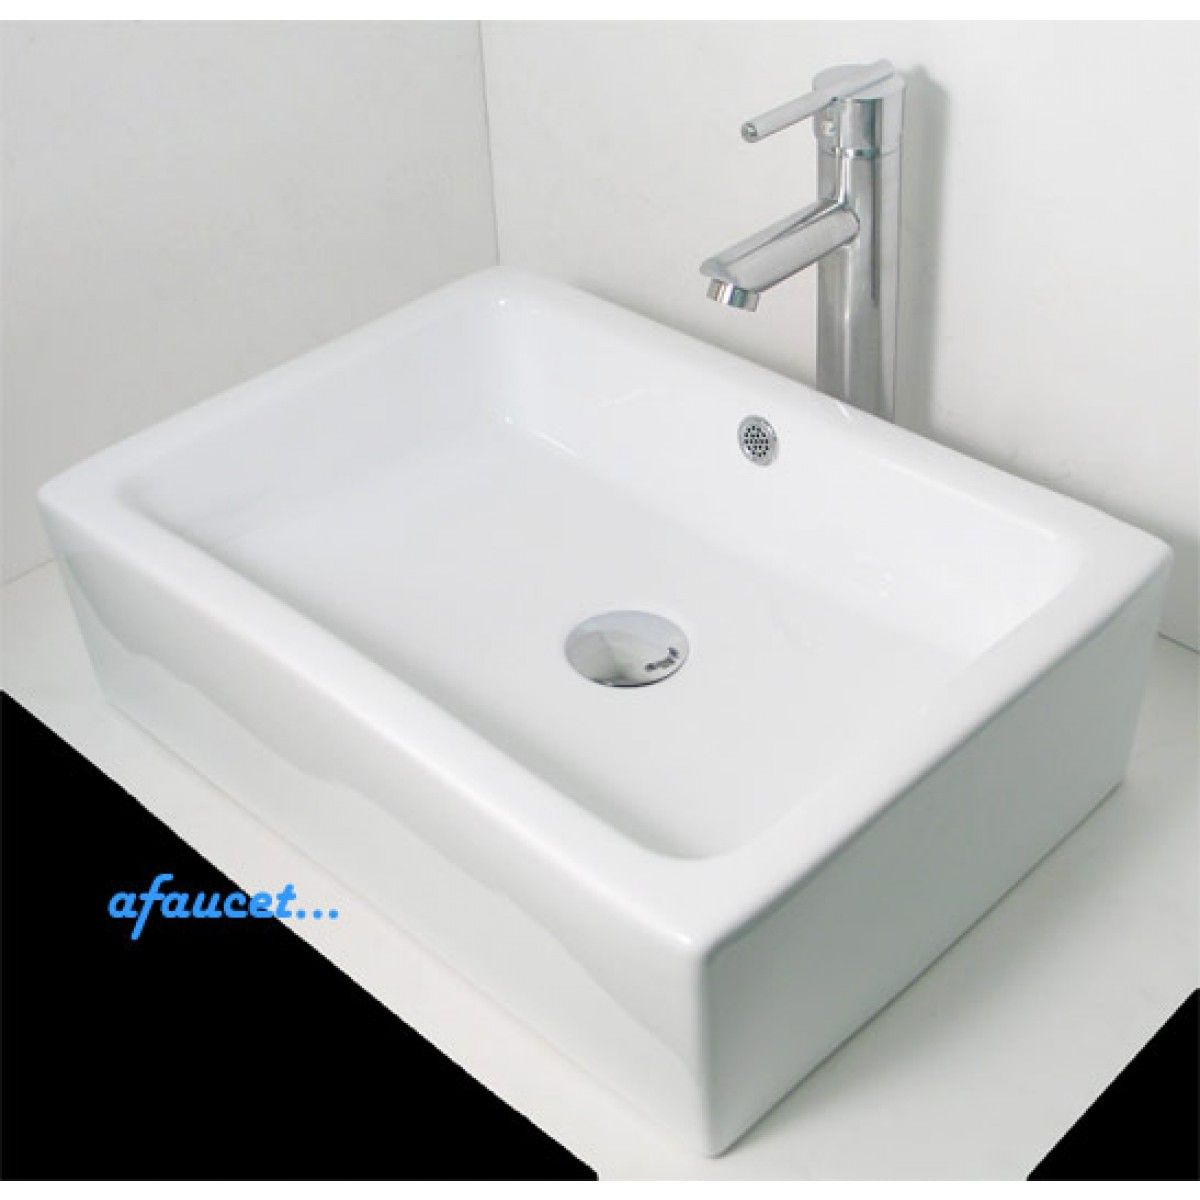 Rectangular Porcelain Ceramic White Black Bathroom Vessel Sink